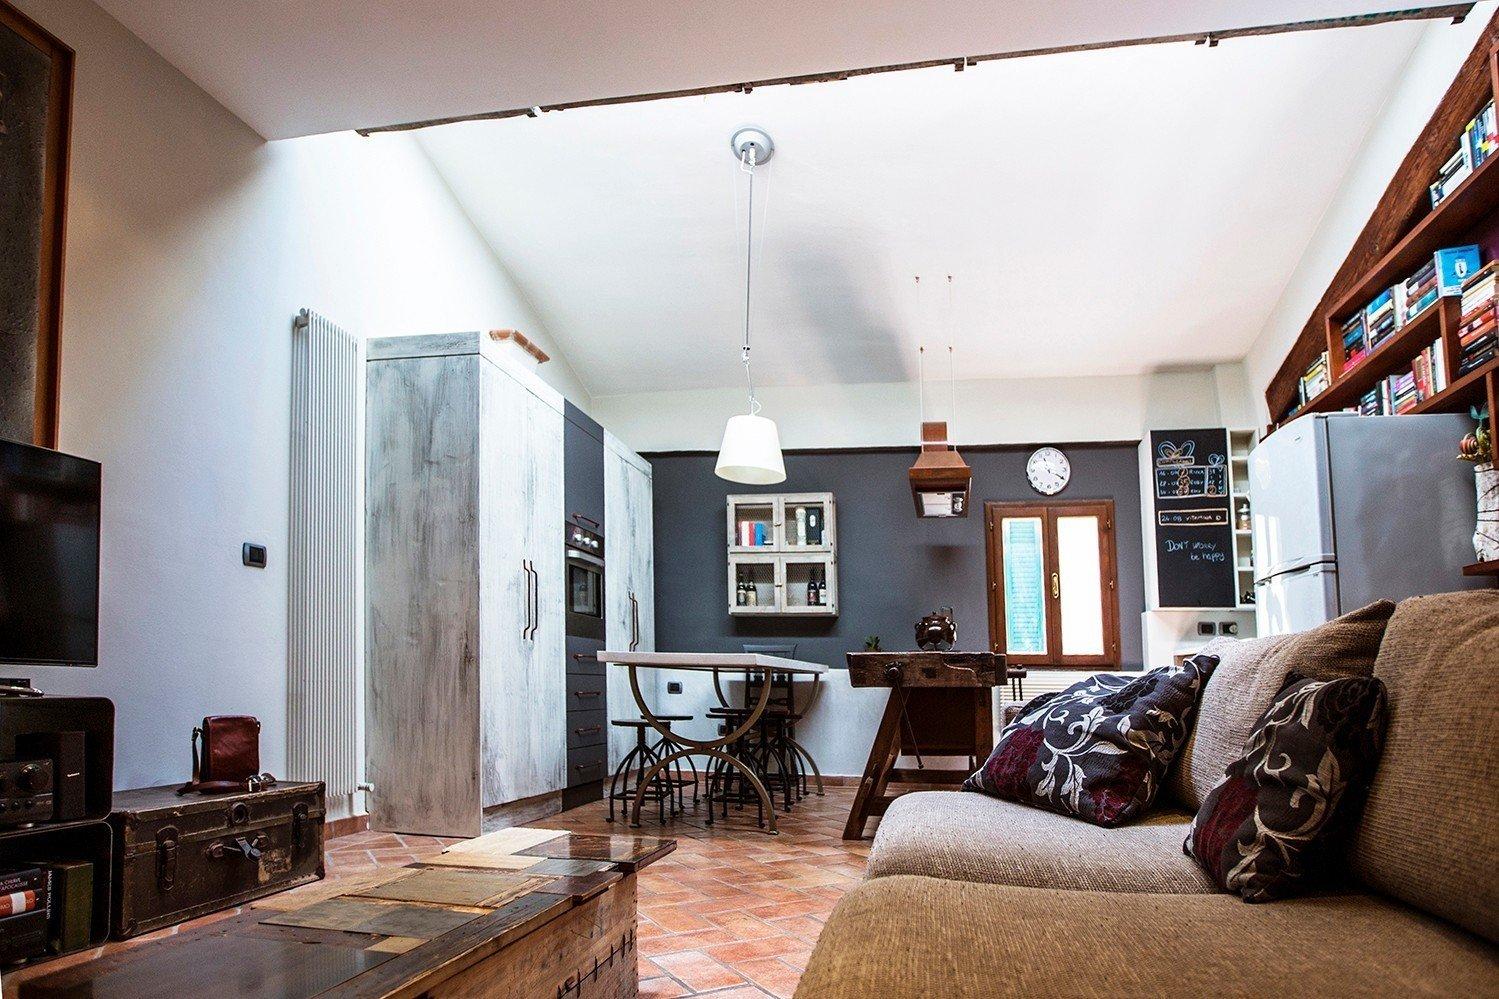 Arredamento Shabby Toscana industrial style interior design - shabby chic - vintage old